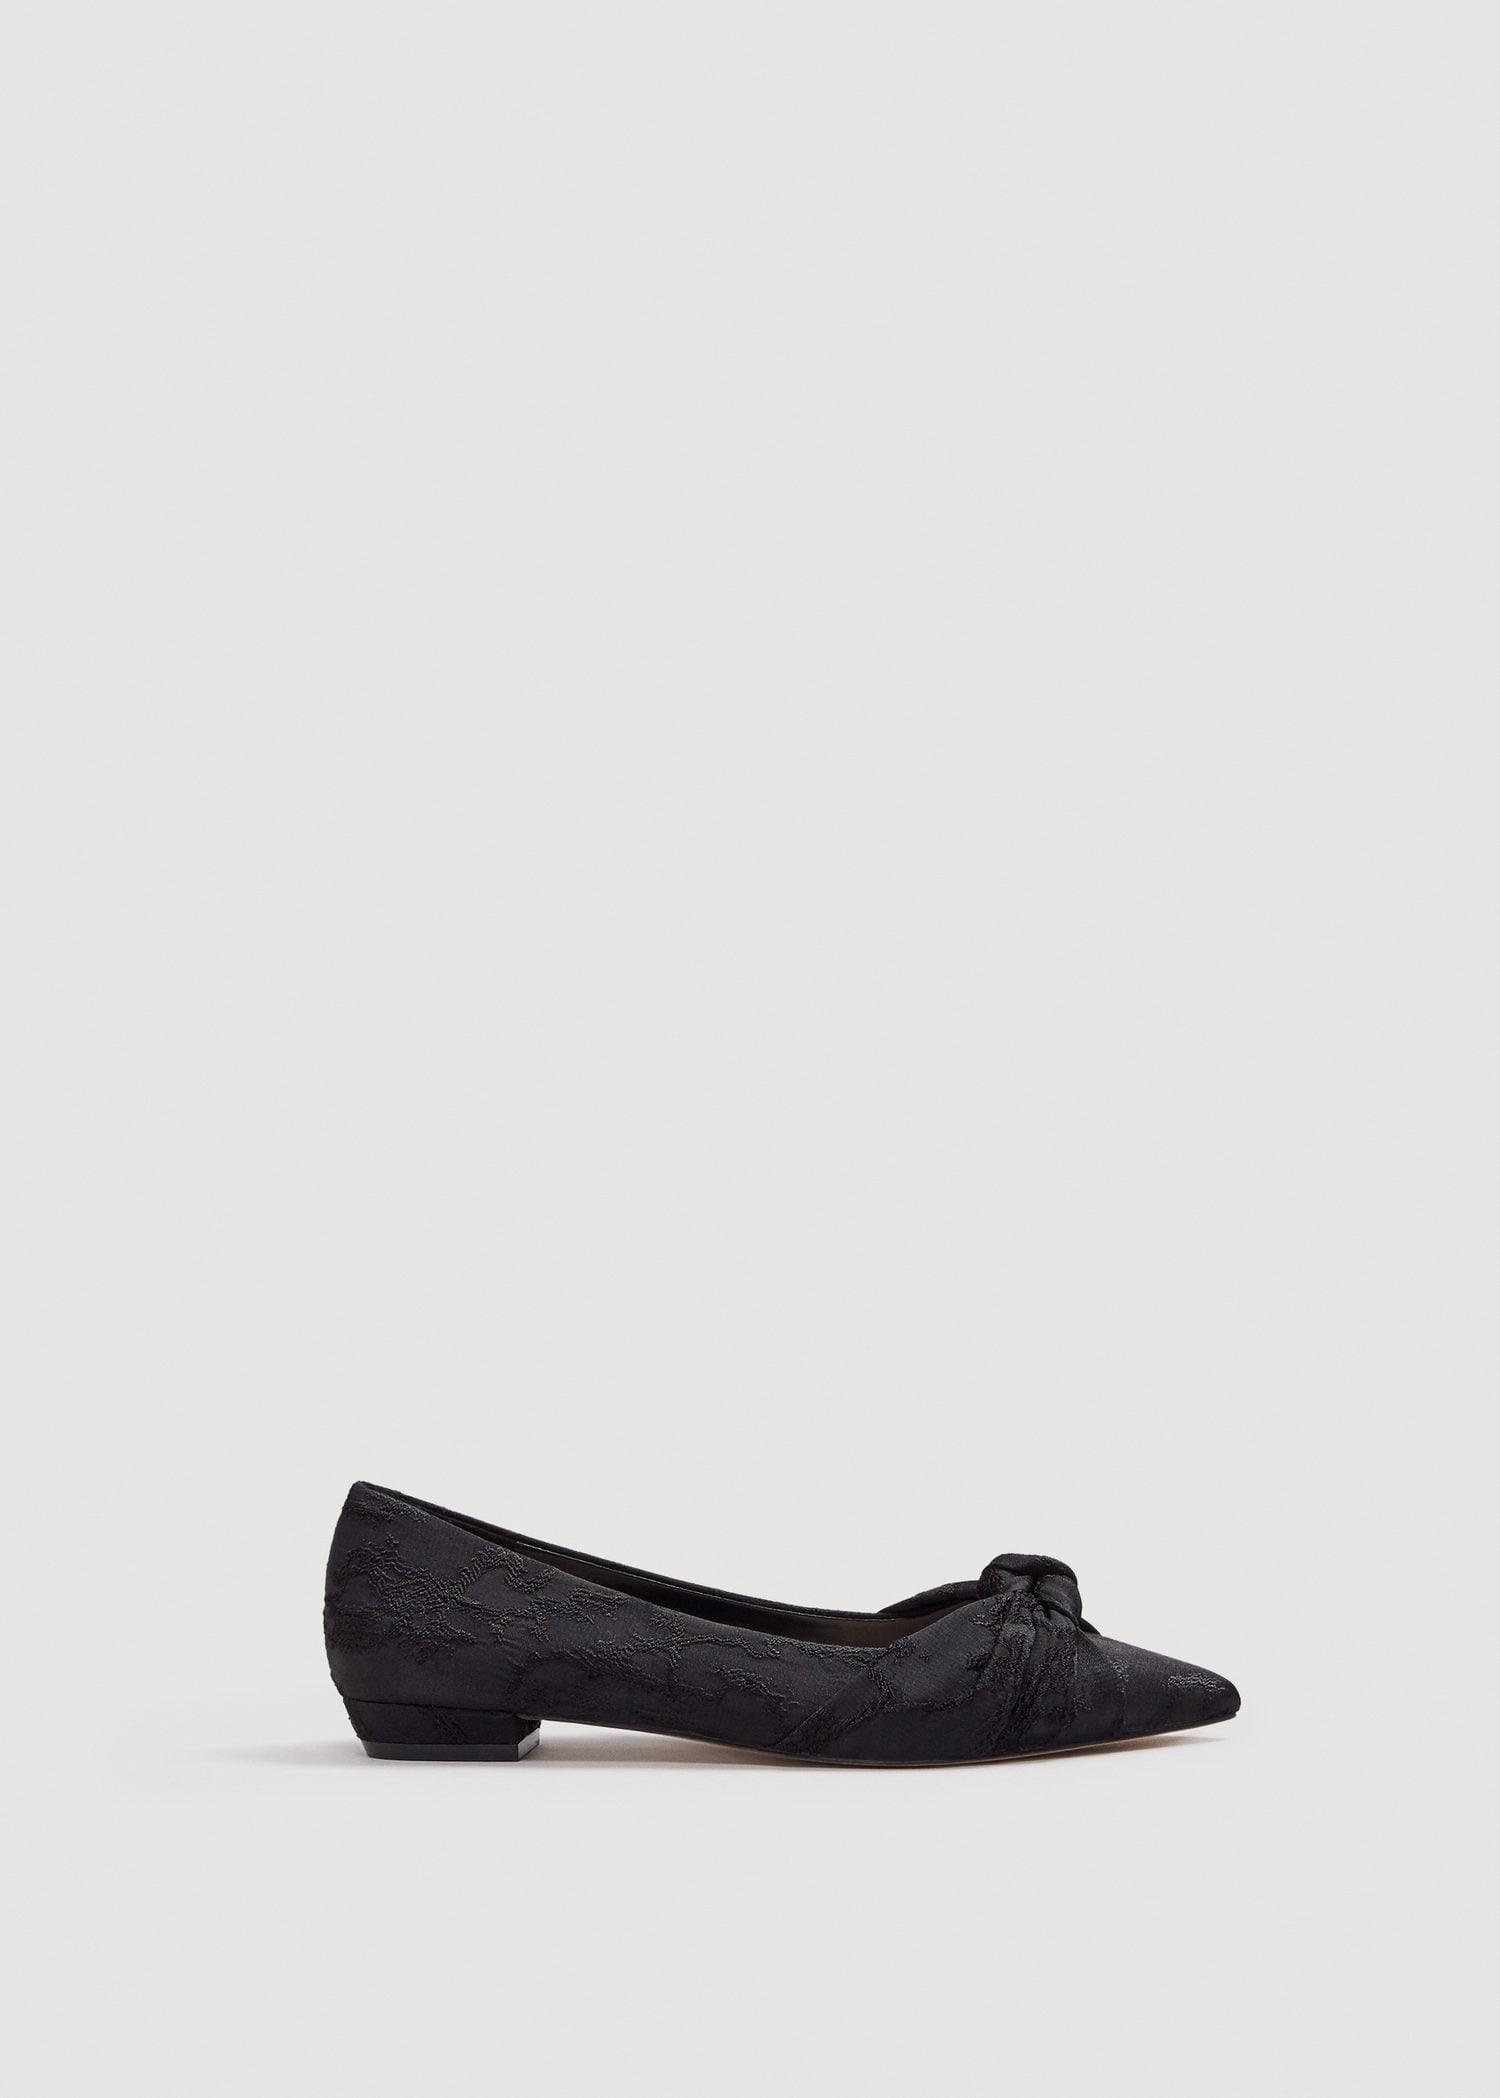 9005c92a091e42 Mango Knot Heel Shoes - 6½